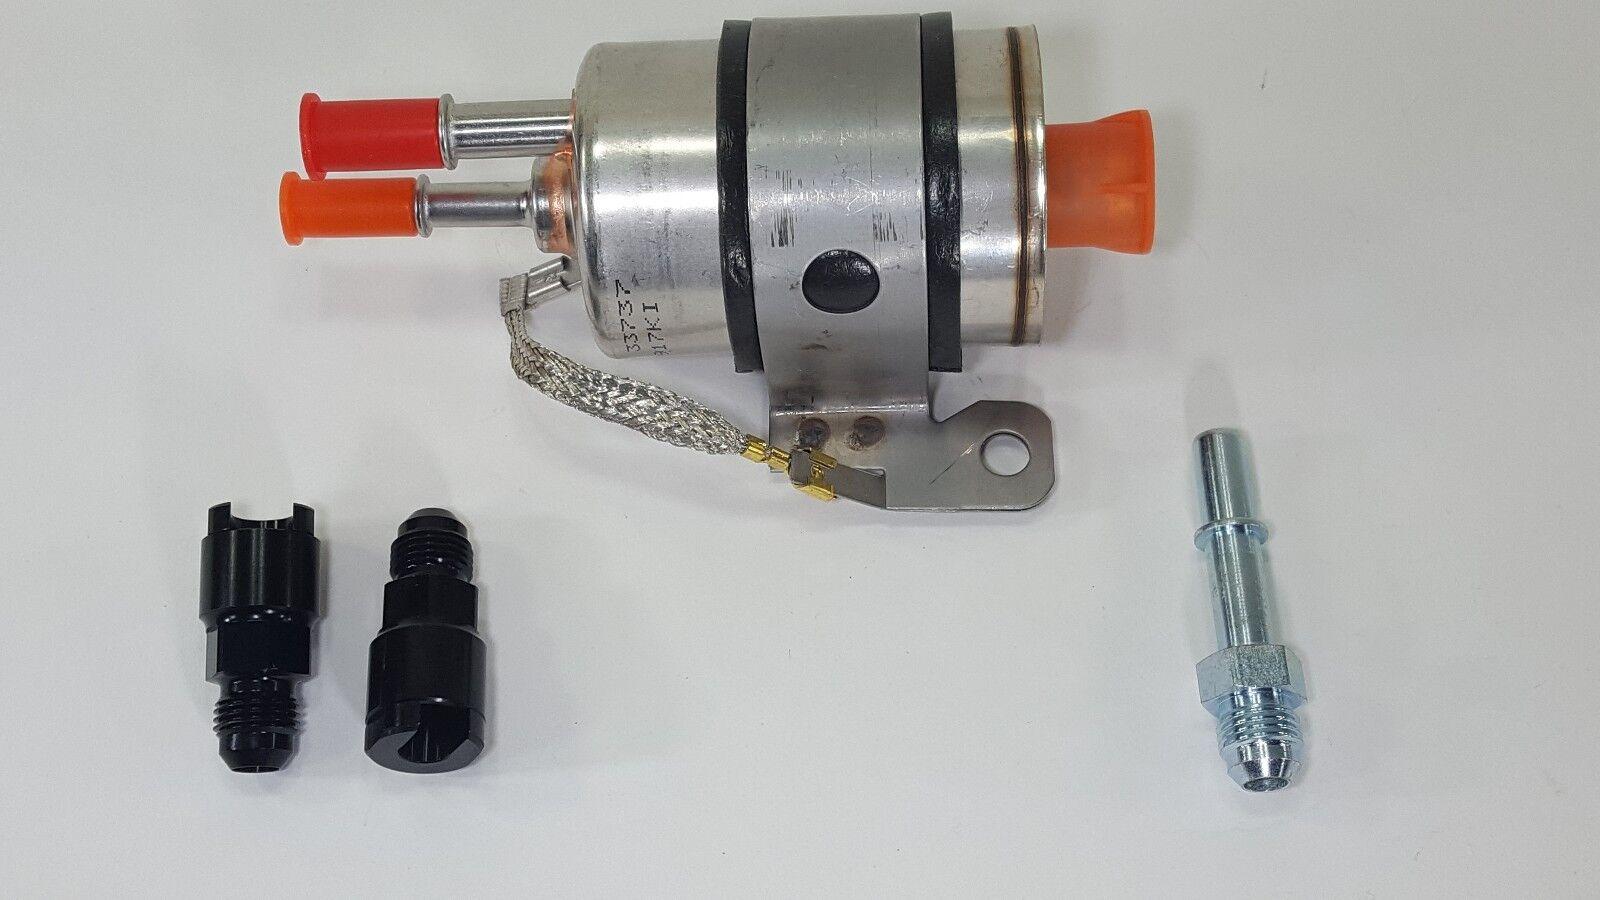 Ls1 Fuel Filter Regulator Kit Engine Swap For Returnless Rails Russell Filters Sale